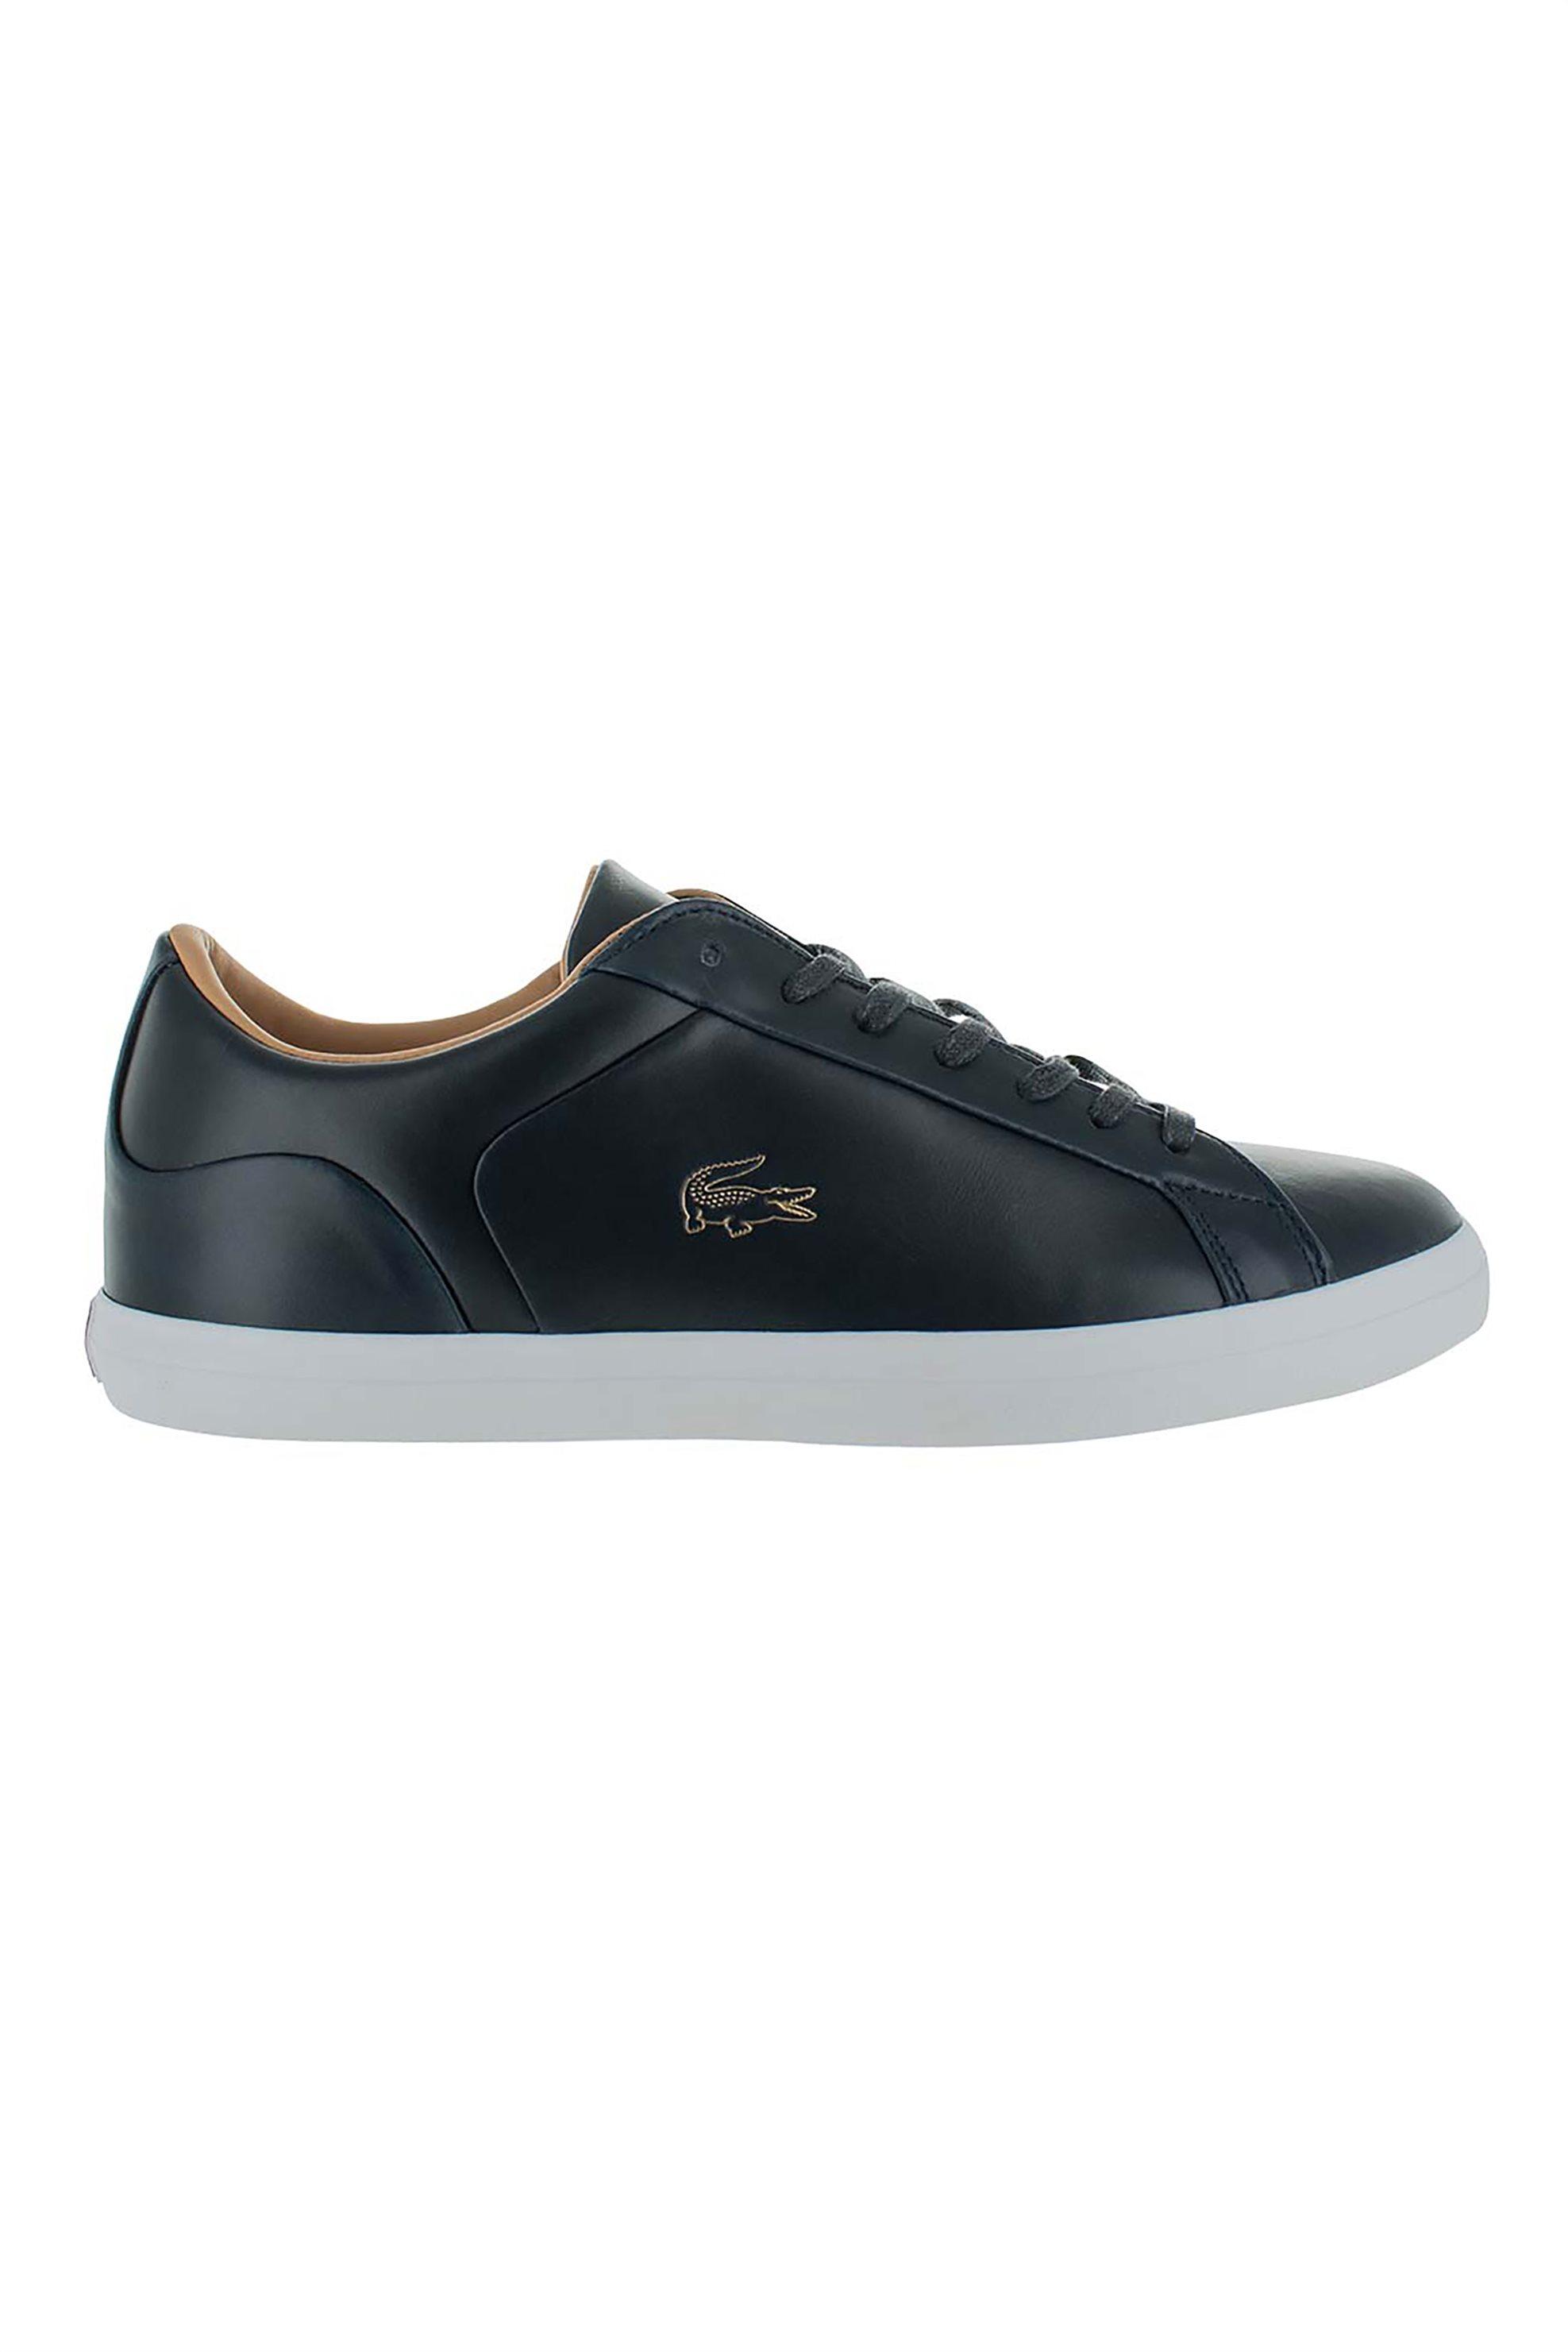 "Lacoste ανδρικα sneakers με χρυσό λογοτυπο ""Lerond"" – 40CMA0012092 – Μπλε Σκούρο"